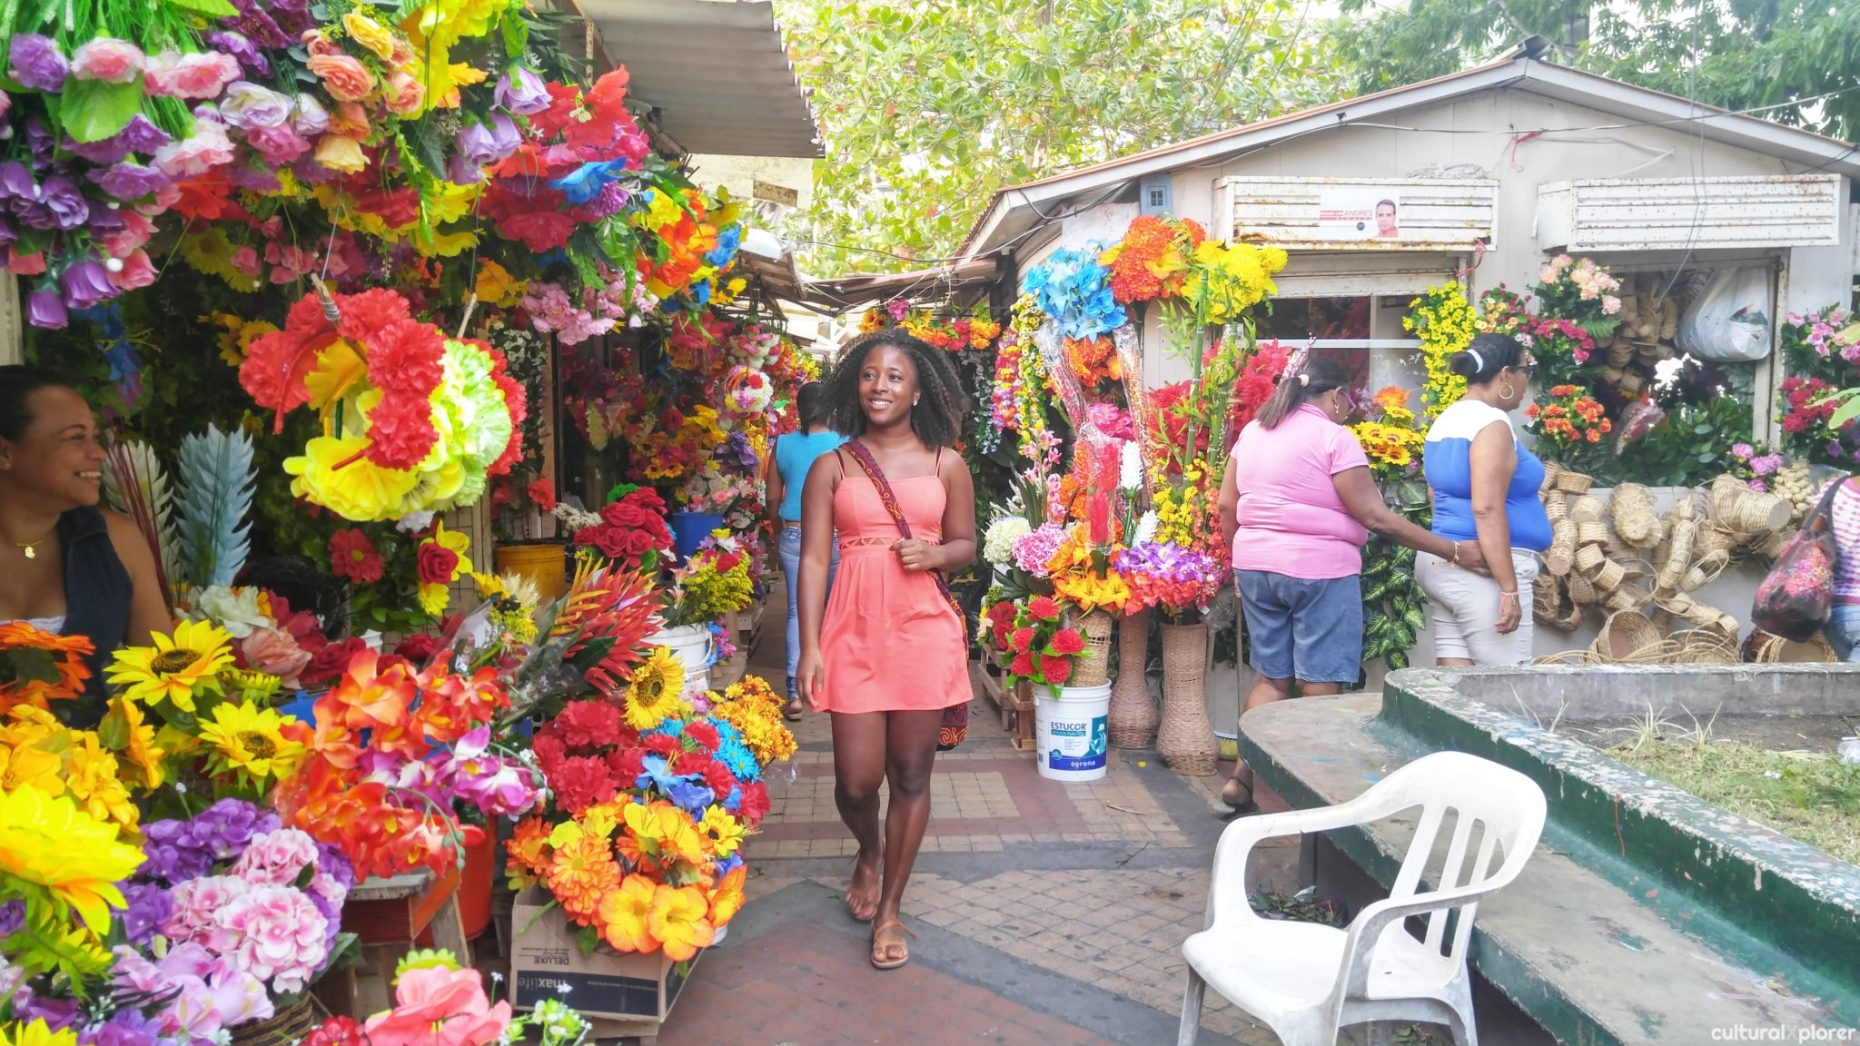 El Parque de las Flores | Cultural Xplorer